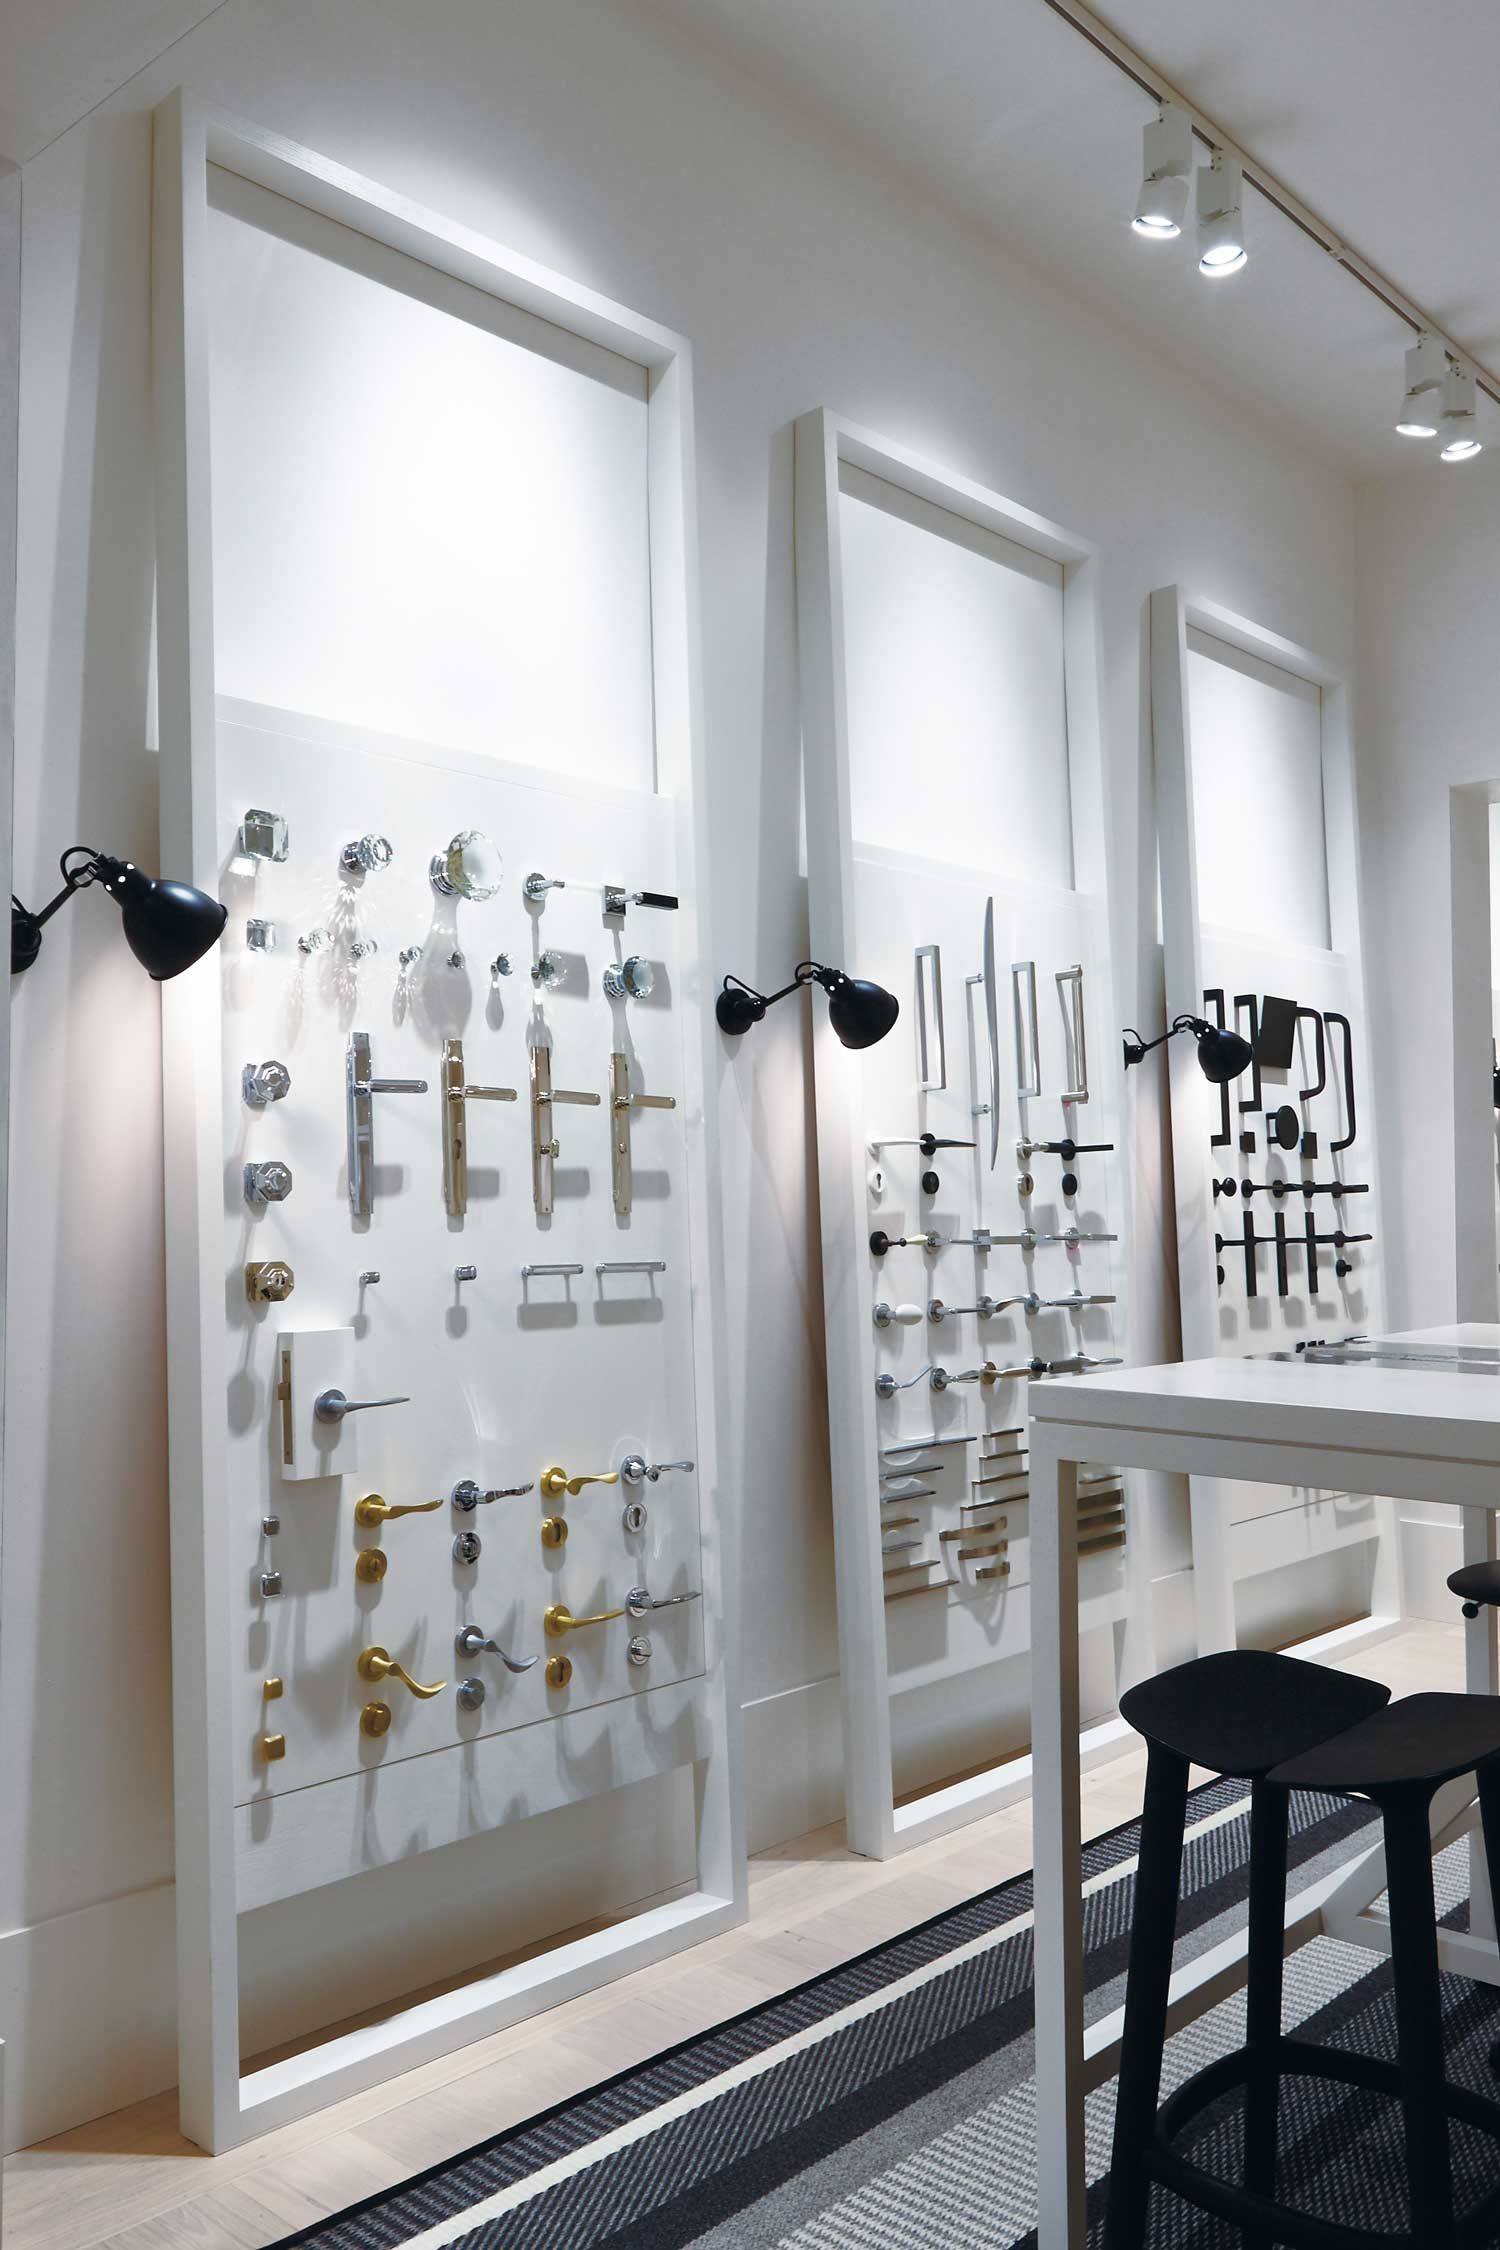 Pittella Melbourne Showroom Hecker Guthrie Inroom Exhibici De Producto Herrajes Para